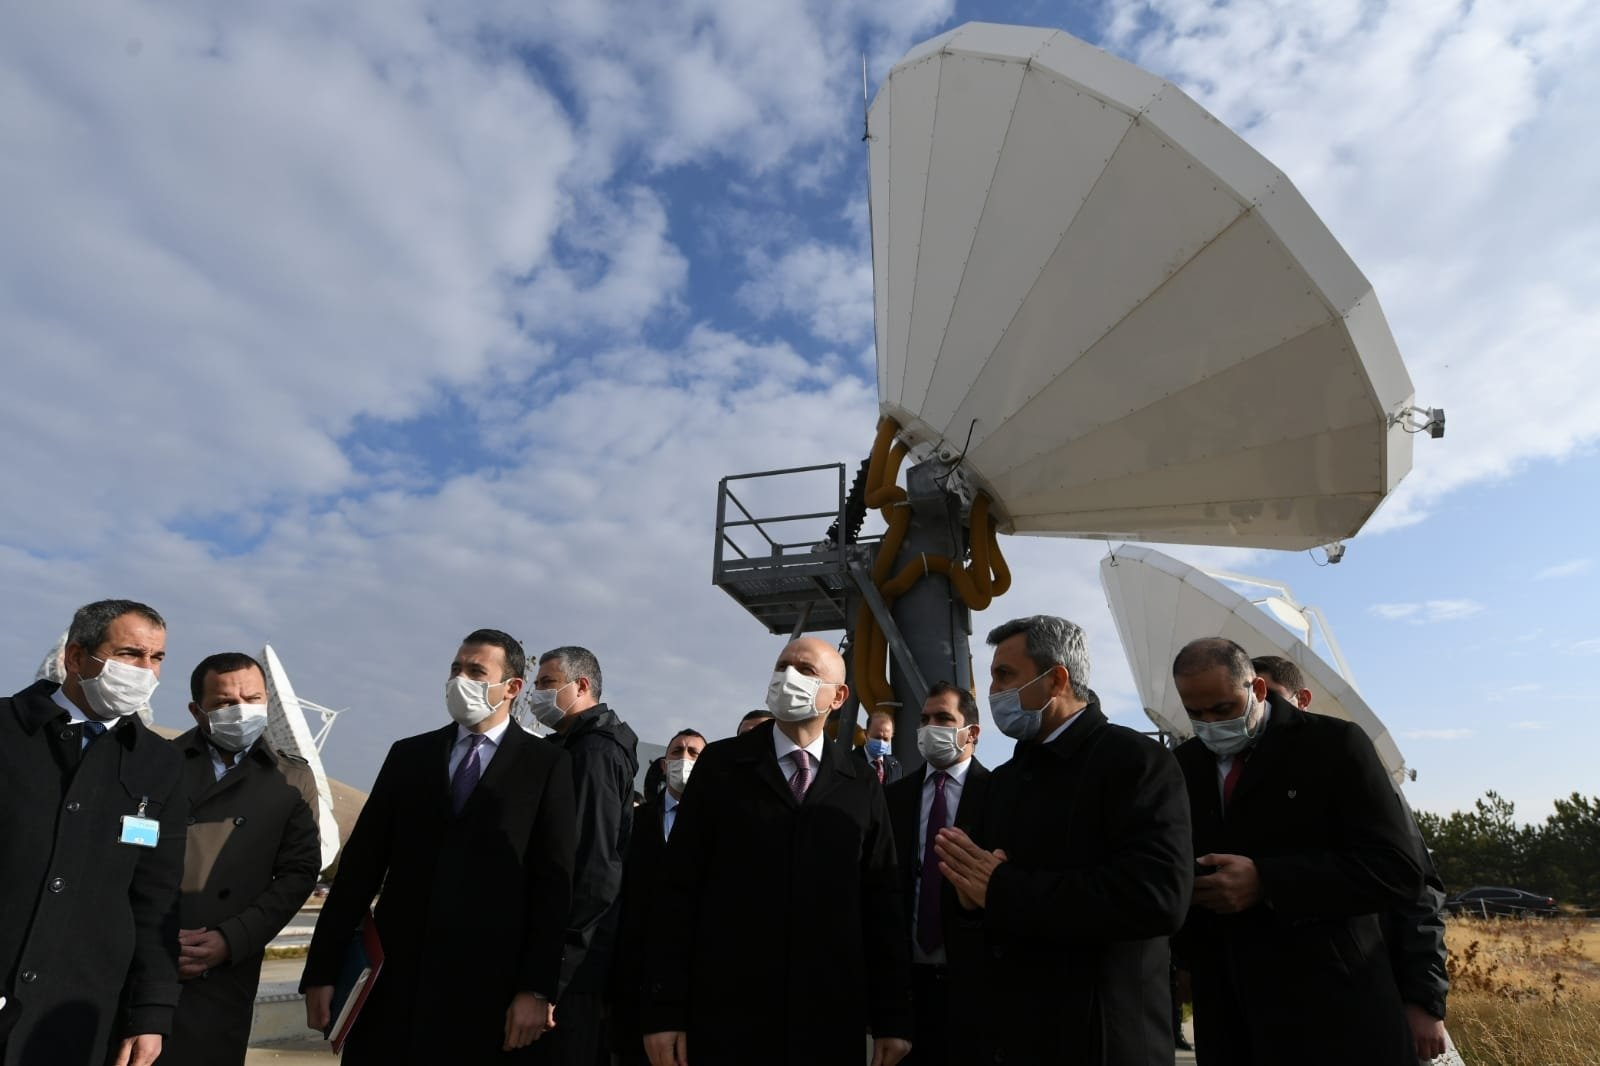 Infrastructure and Transport Minister Adil Karaismailoğlu visits the Türksat Gölbaşı Central Compound in capital Ankara, Turkey, Dec. 2, 2020. (DHA Photo)